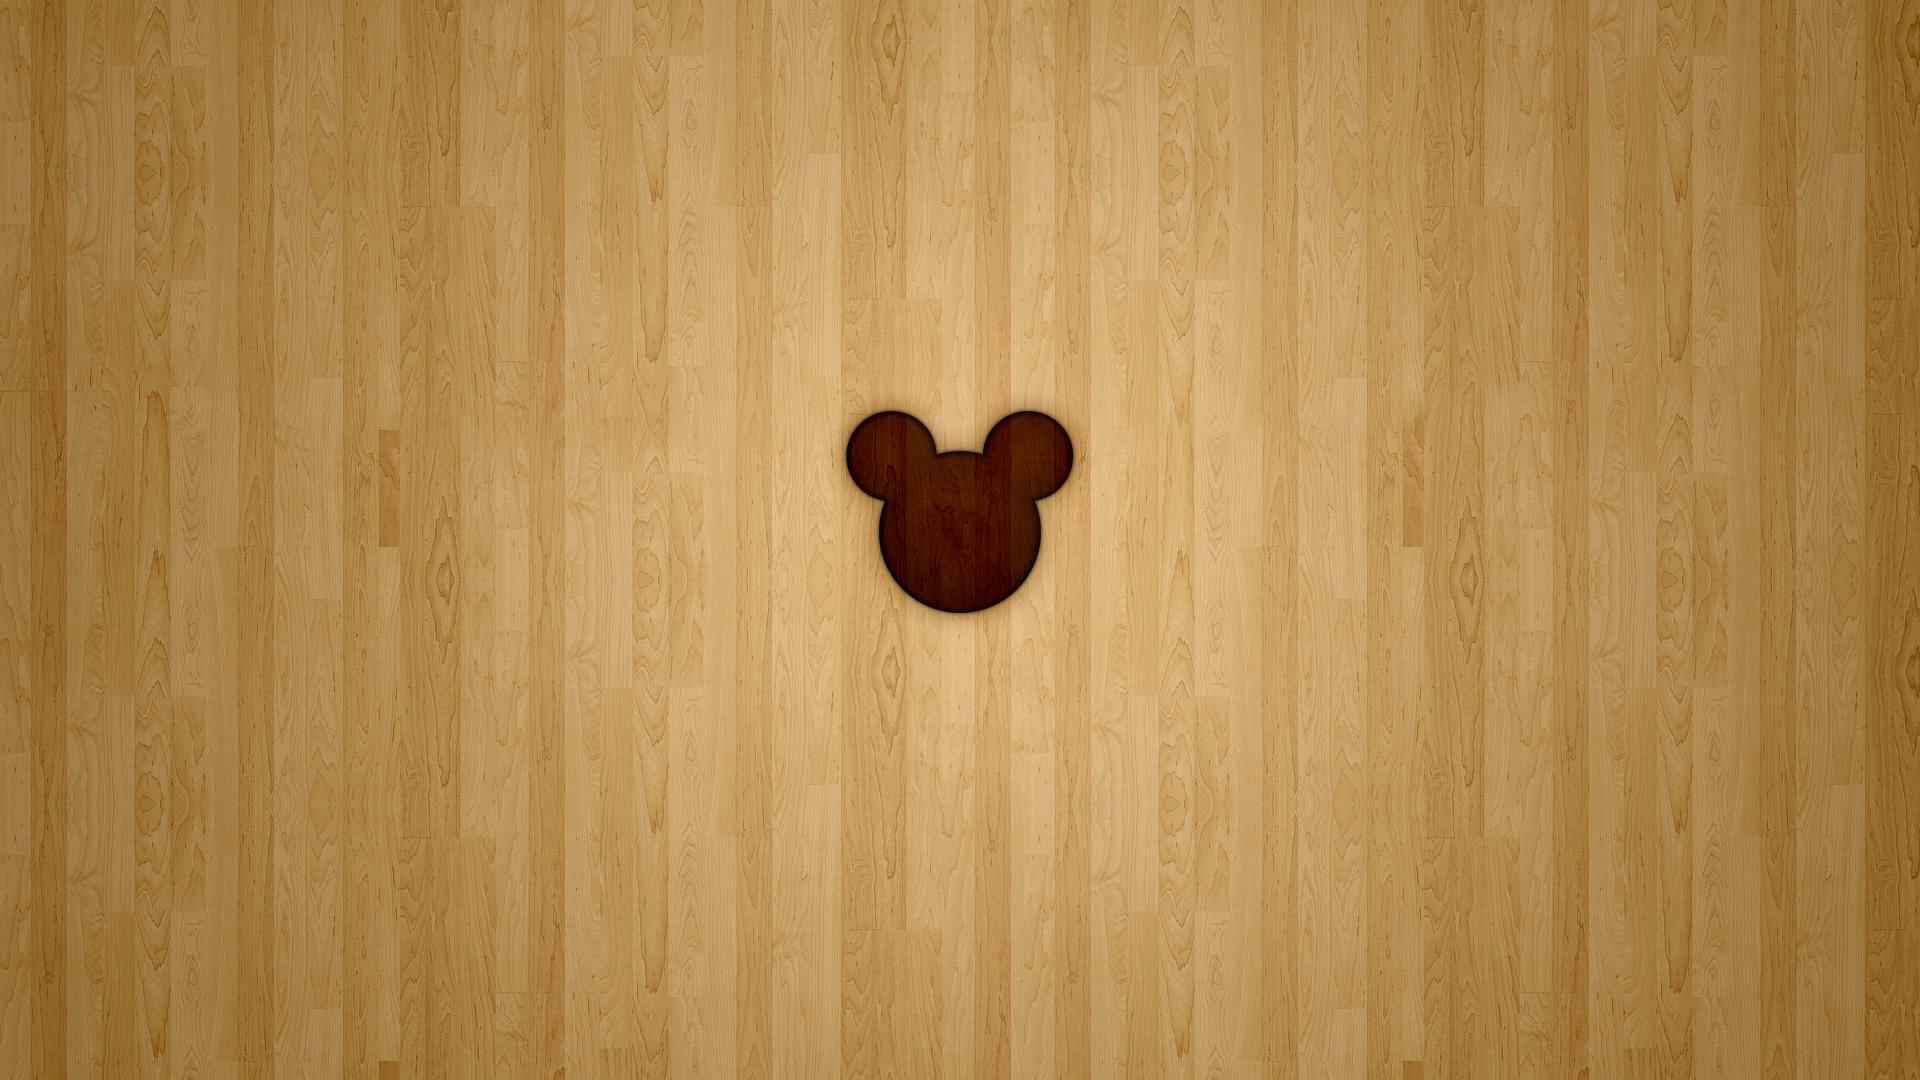 mickey mouse disney hd desktop wallpaper widescreen high